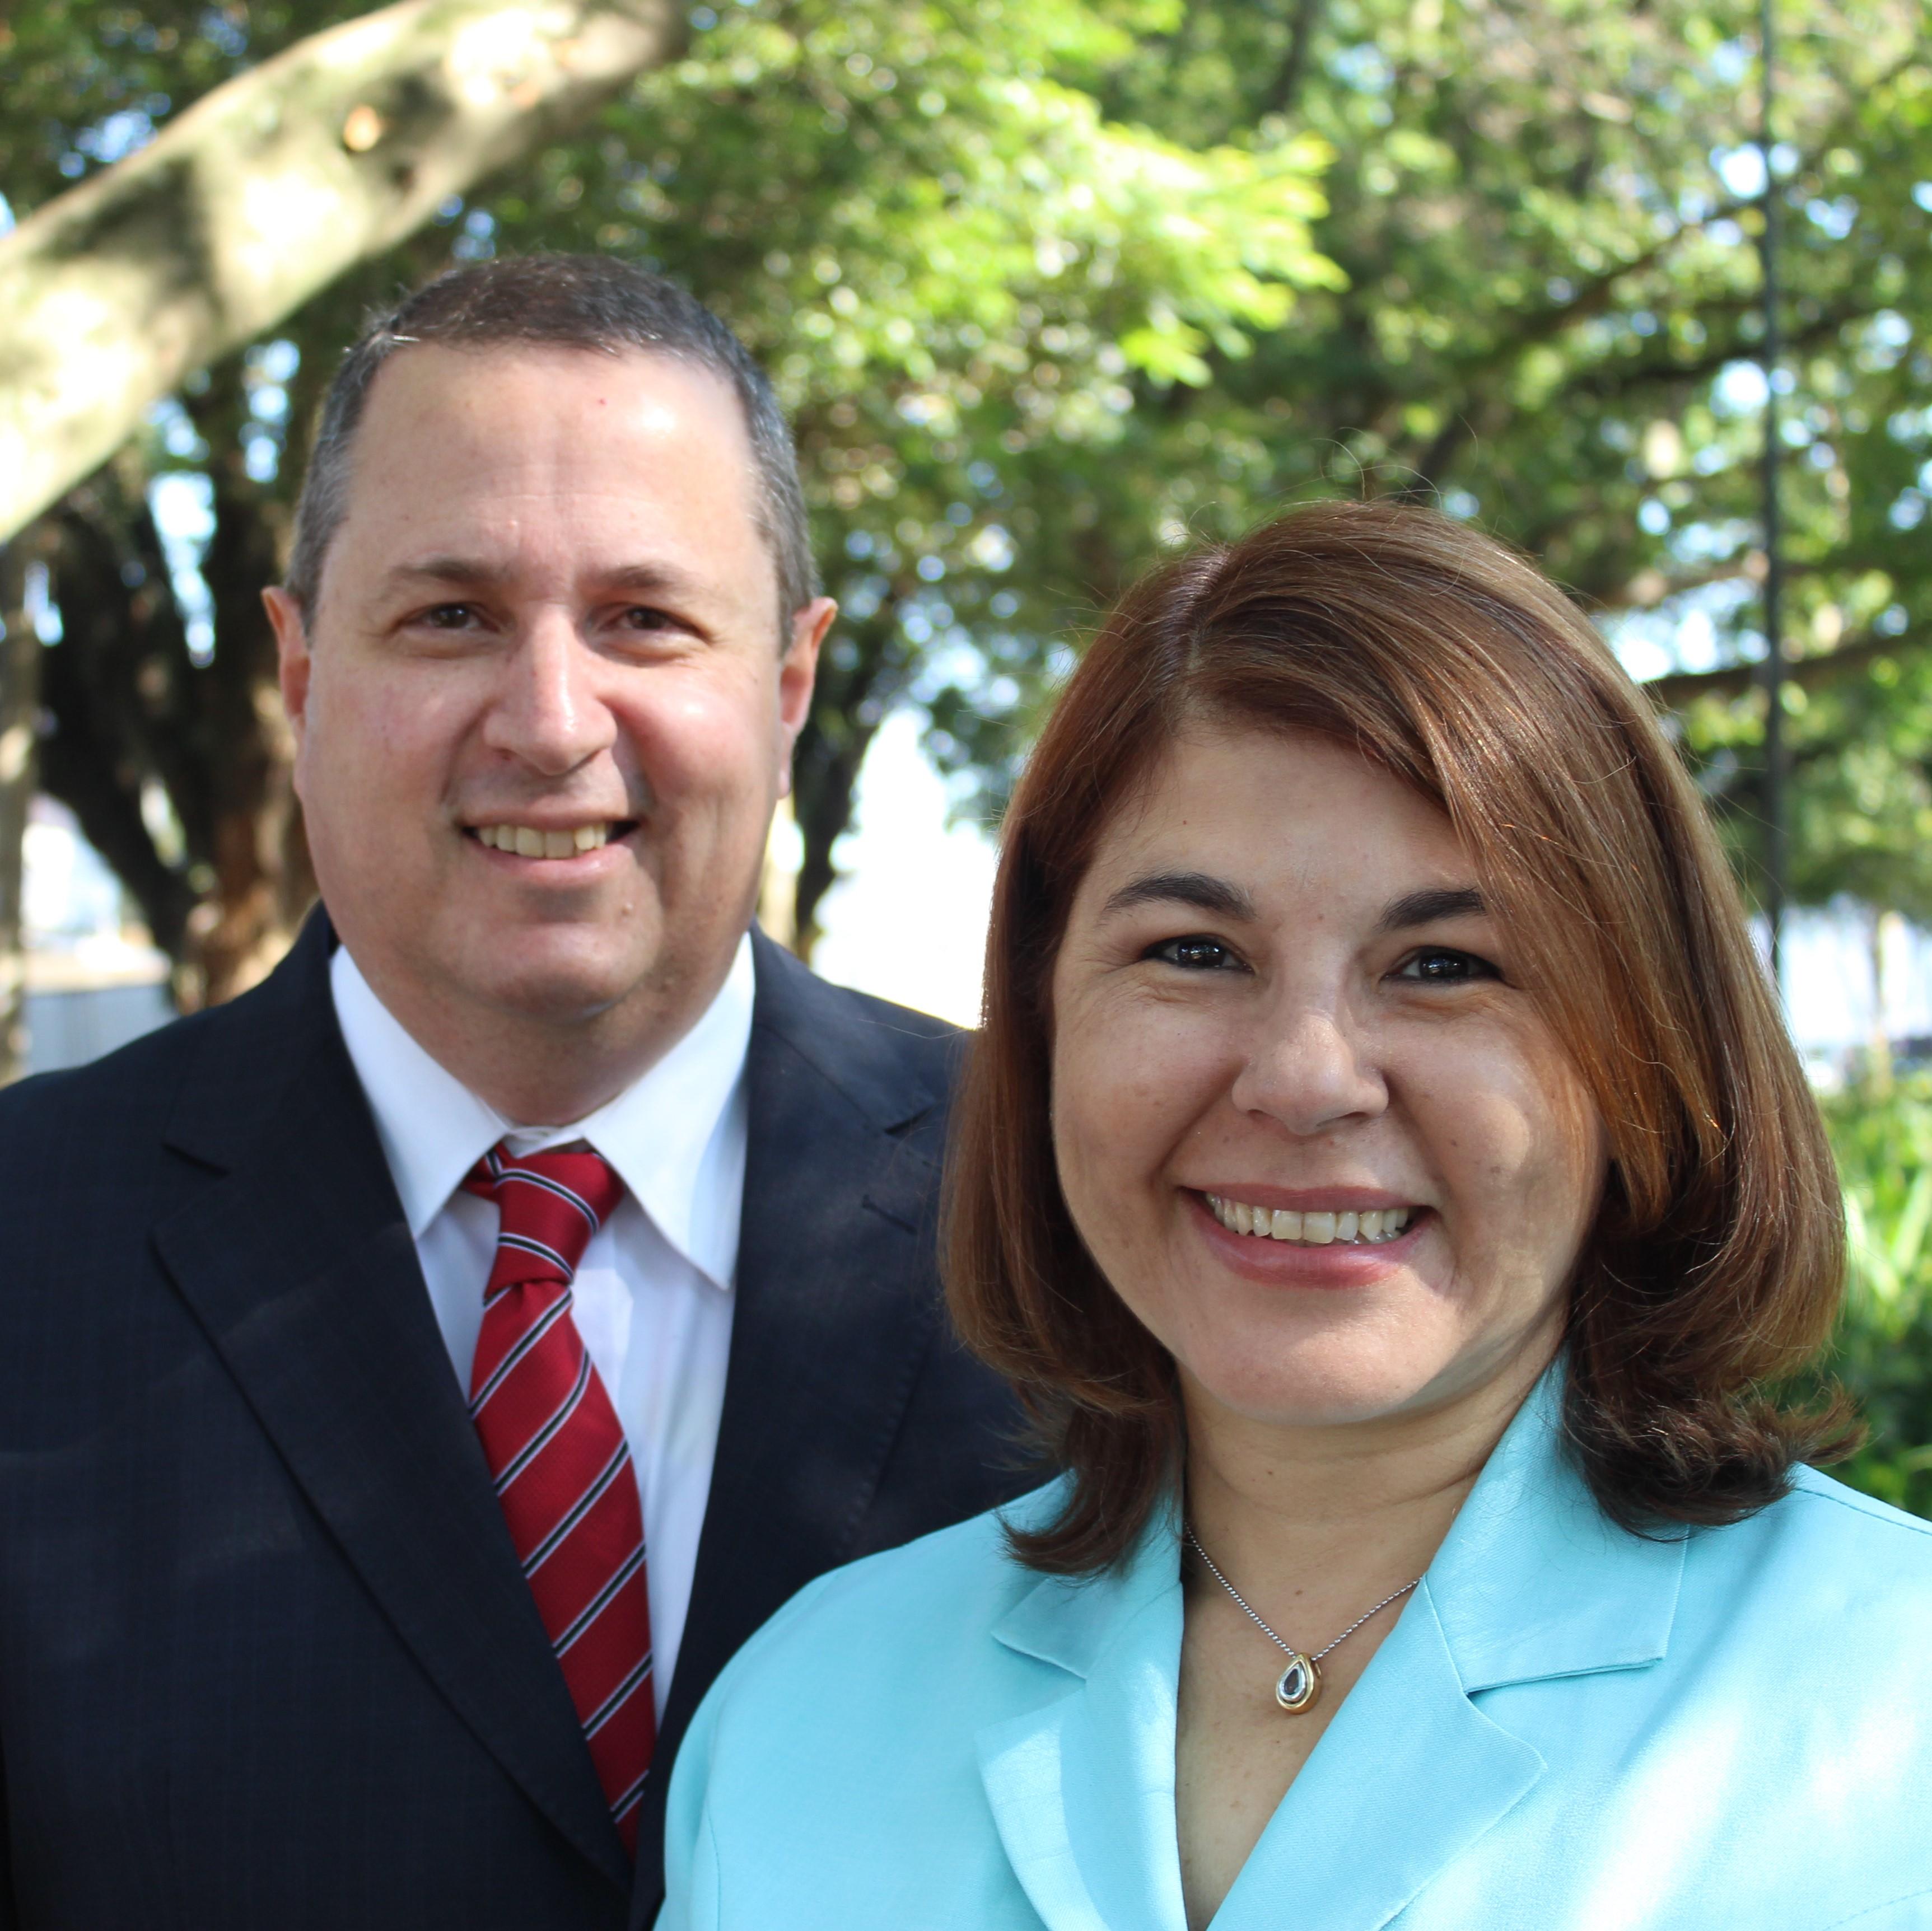 Emilton and Aparecida Miranda